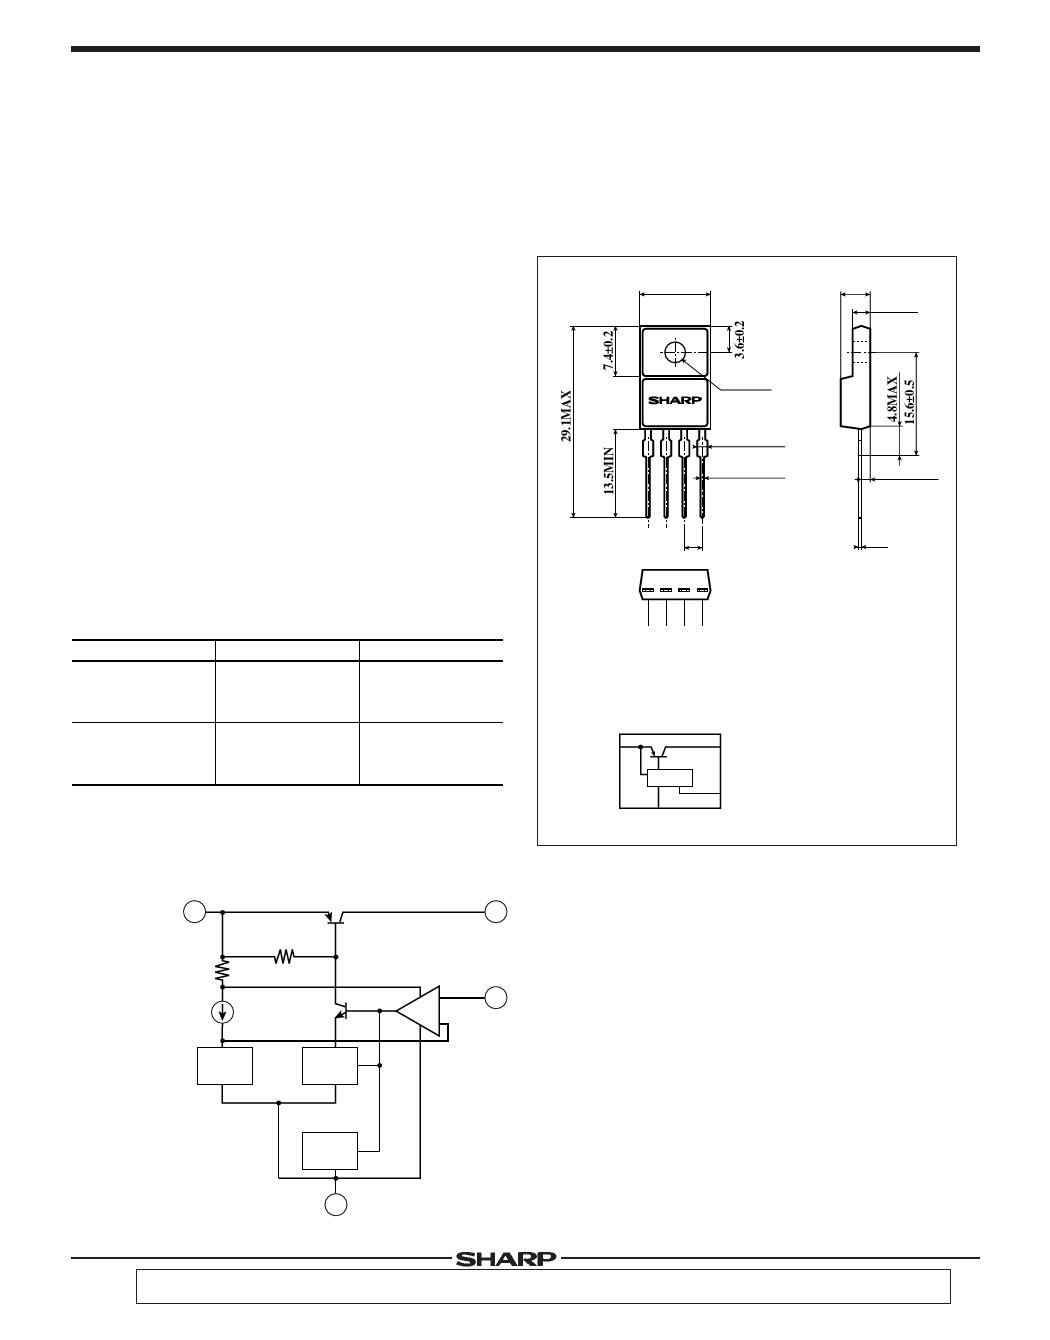 P030RV21 Datasheet PDF, Sharp Electronics :: QDATASHEET